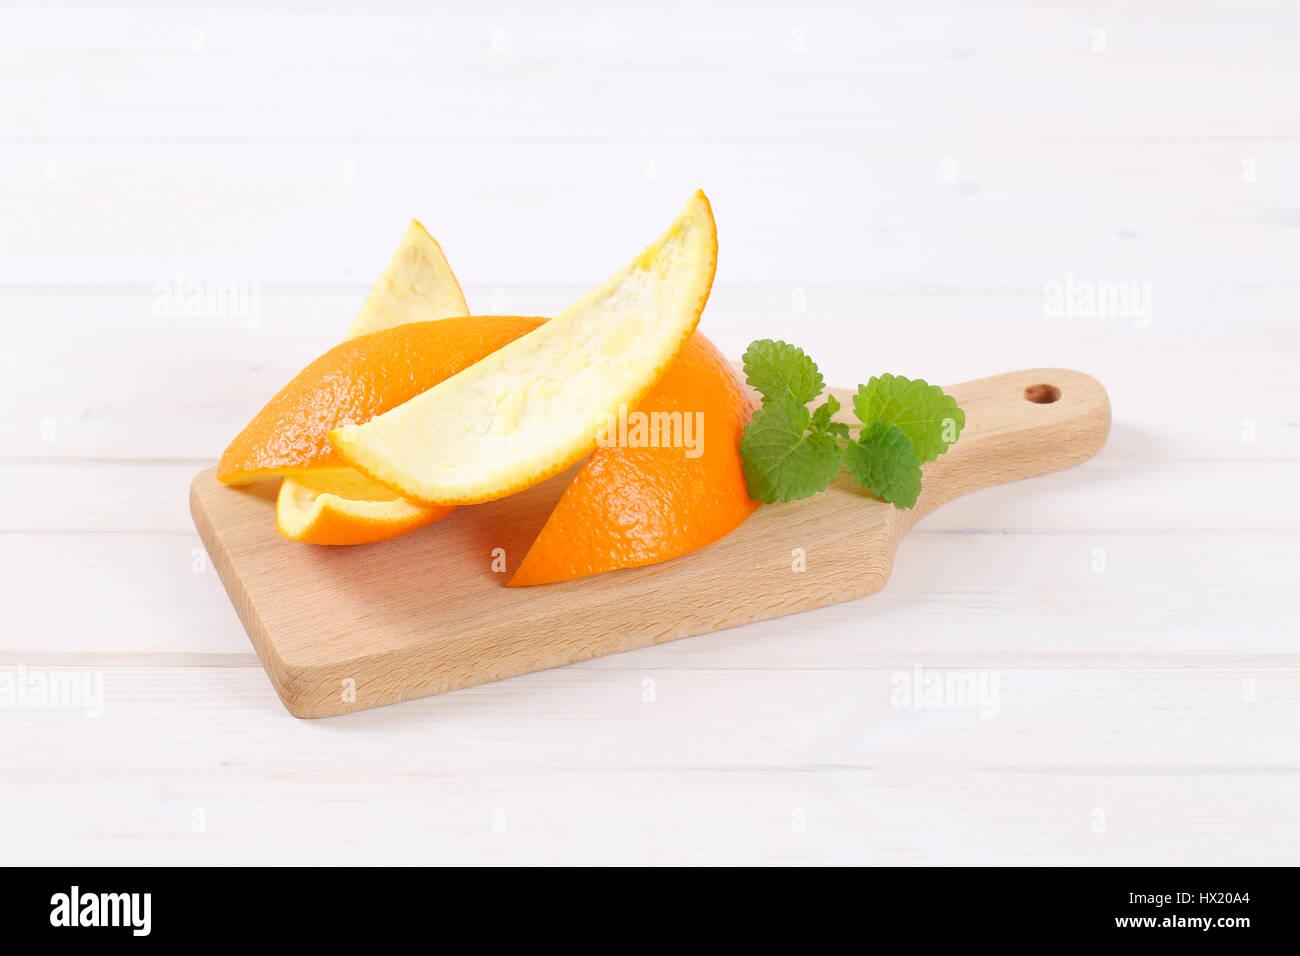 pile of orange peels on wooden cutting board - Stock Image